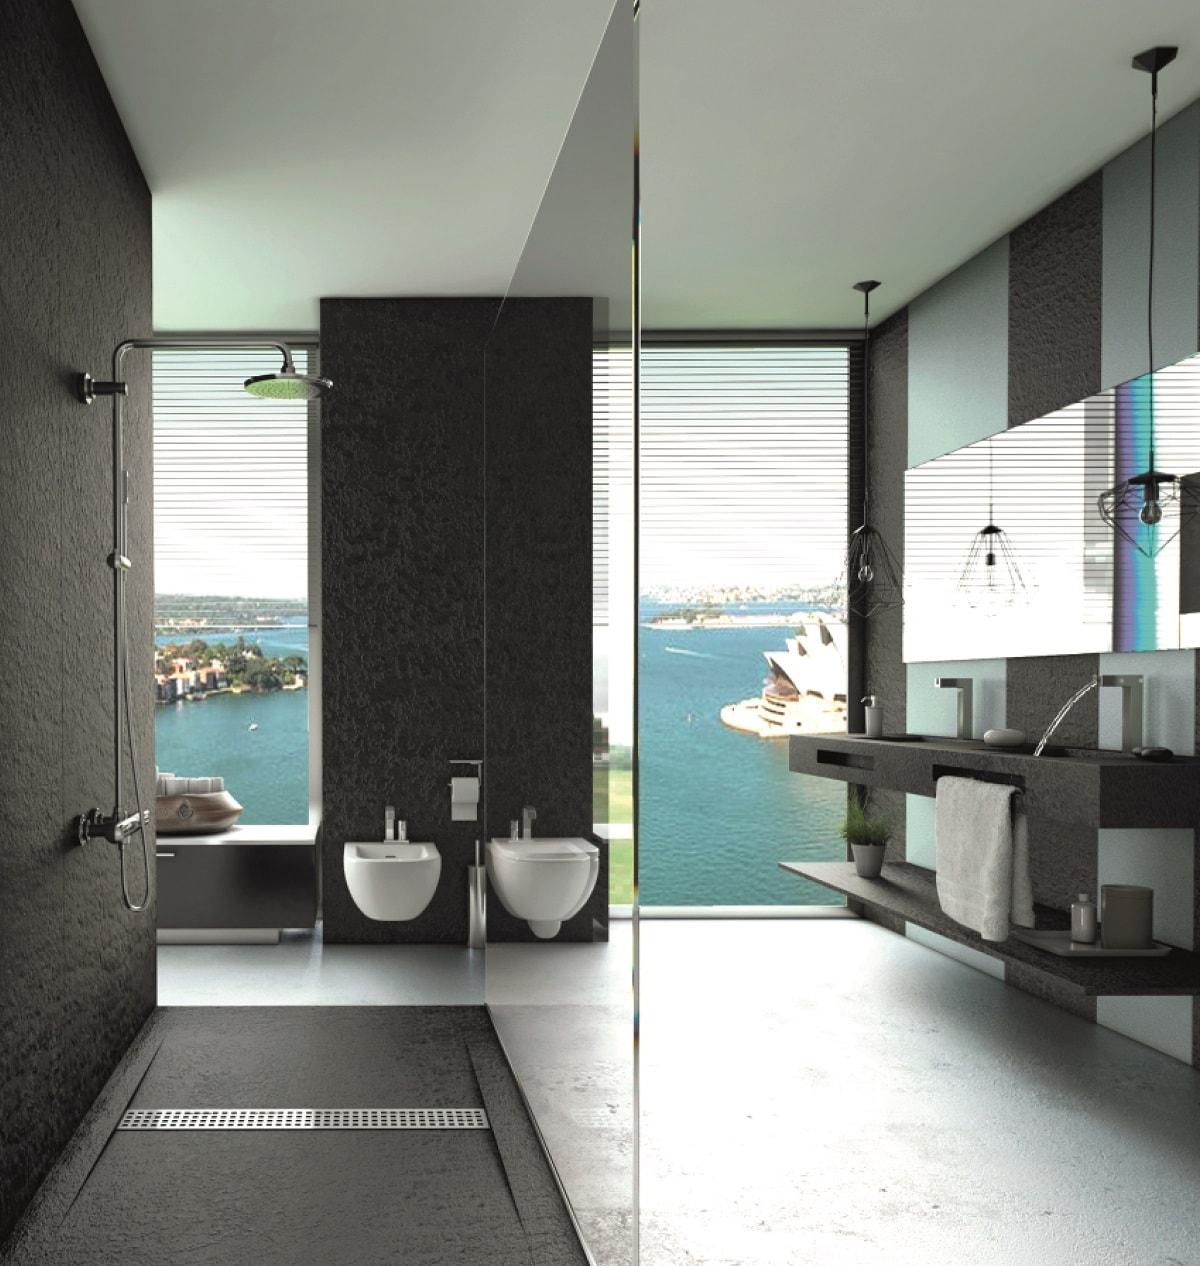 salle-de-bain-quaedesign-bois-min